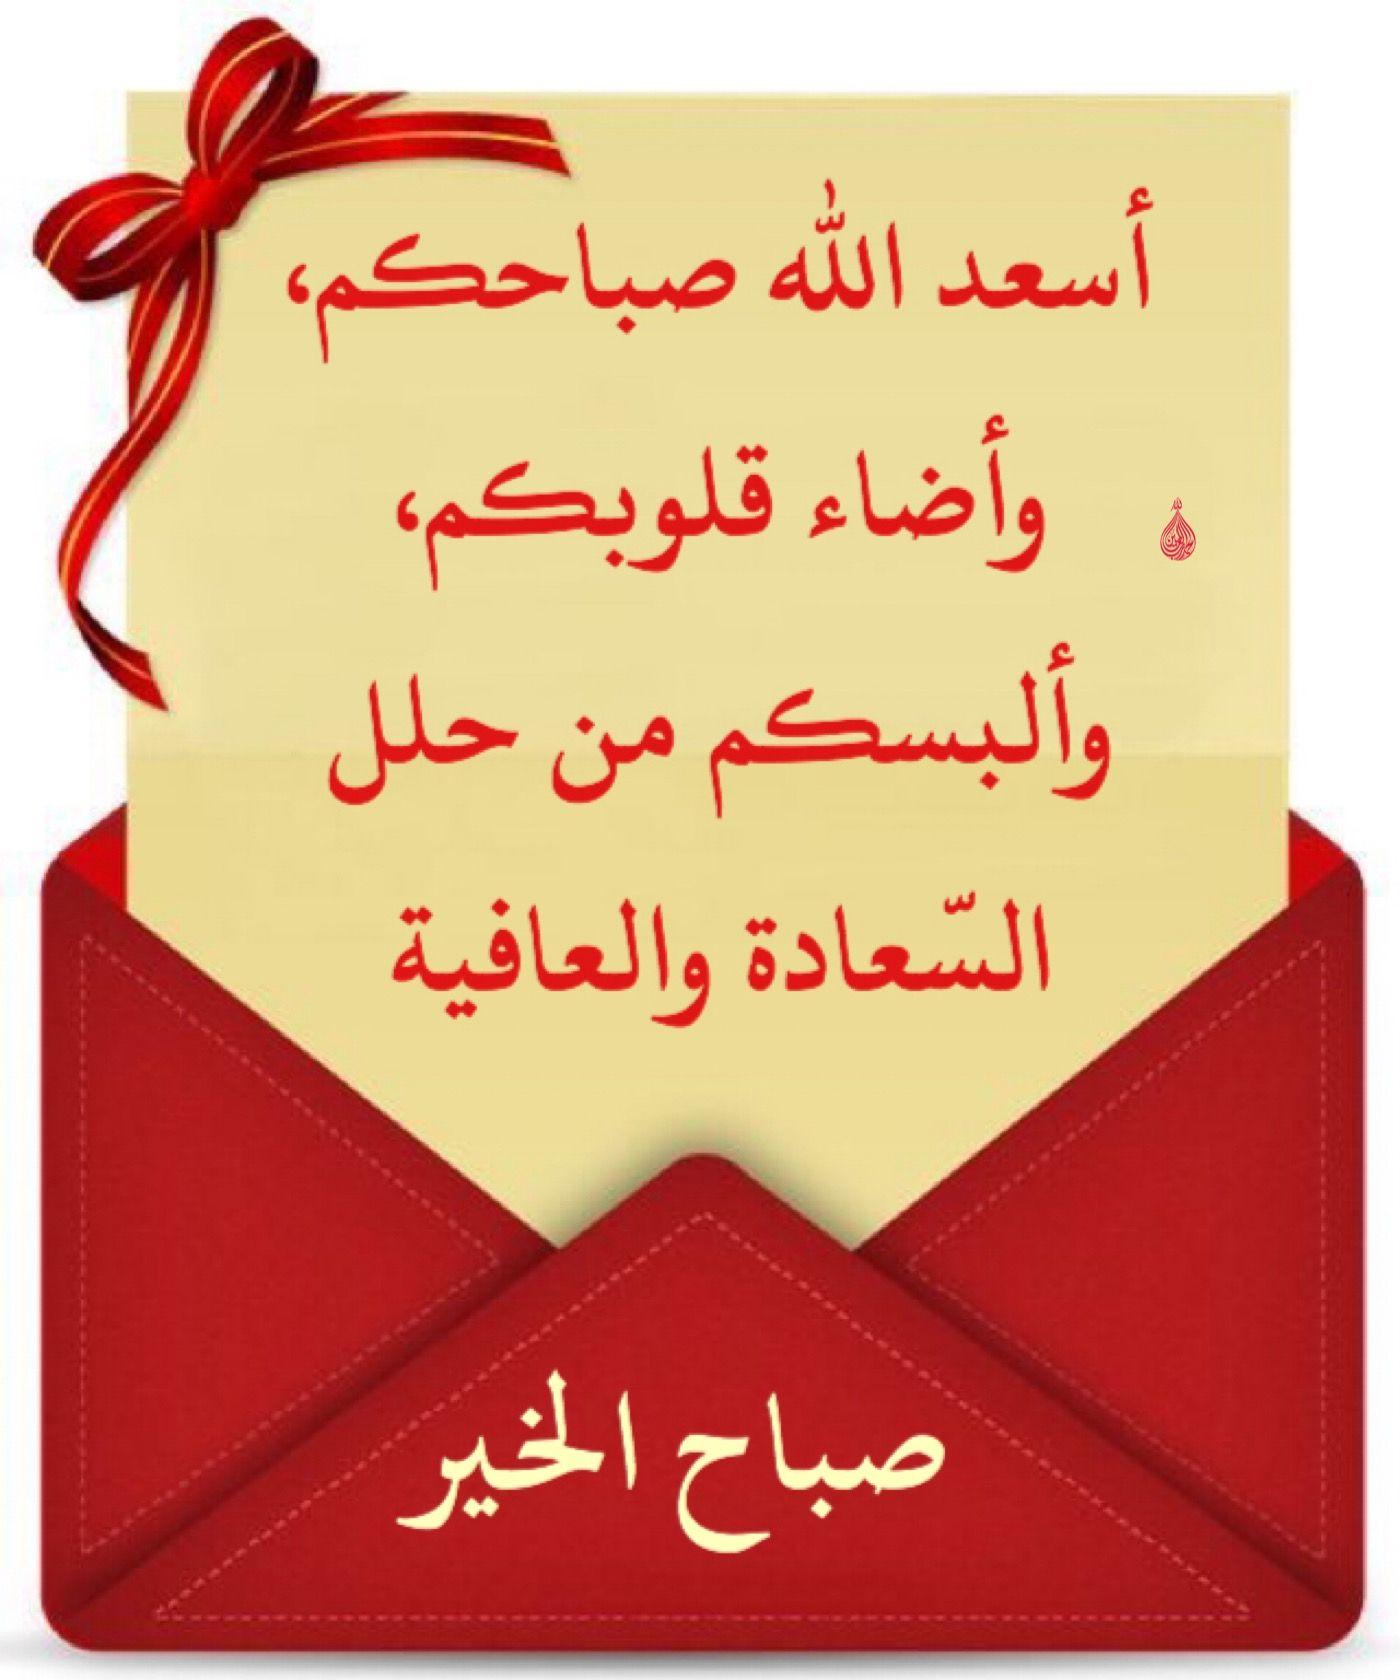 Pin By Mjeed M F On صباحيات In 2021 Beautiful Chickens Arabic Love Quotes Ramadan Kareem